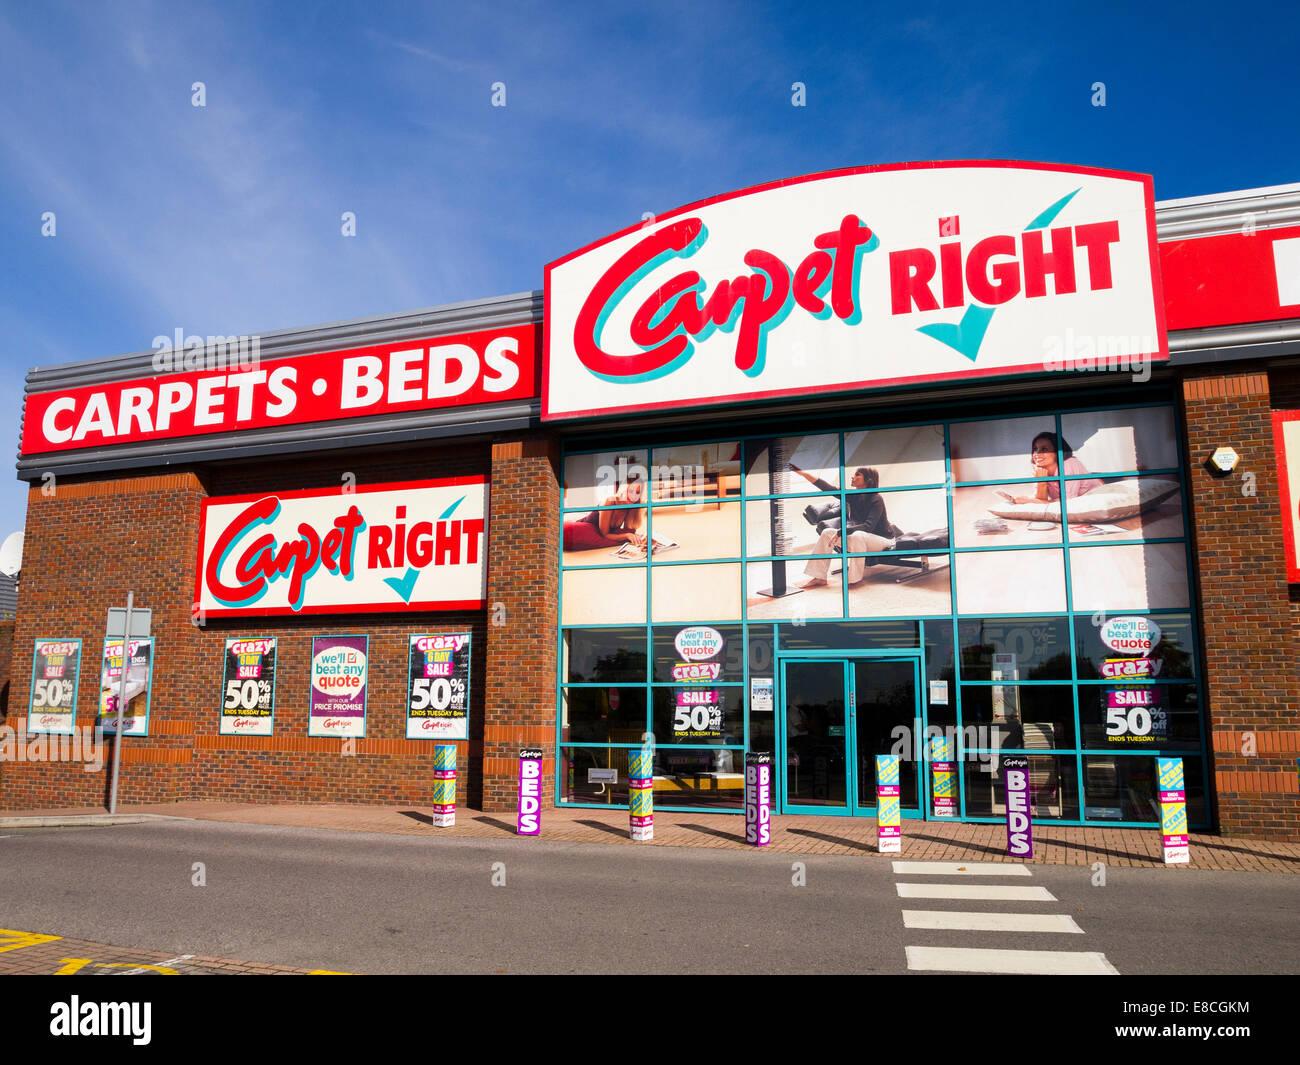 Carpet Right, Slough shopping park, England, UK - Stock Image